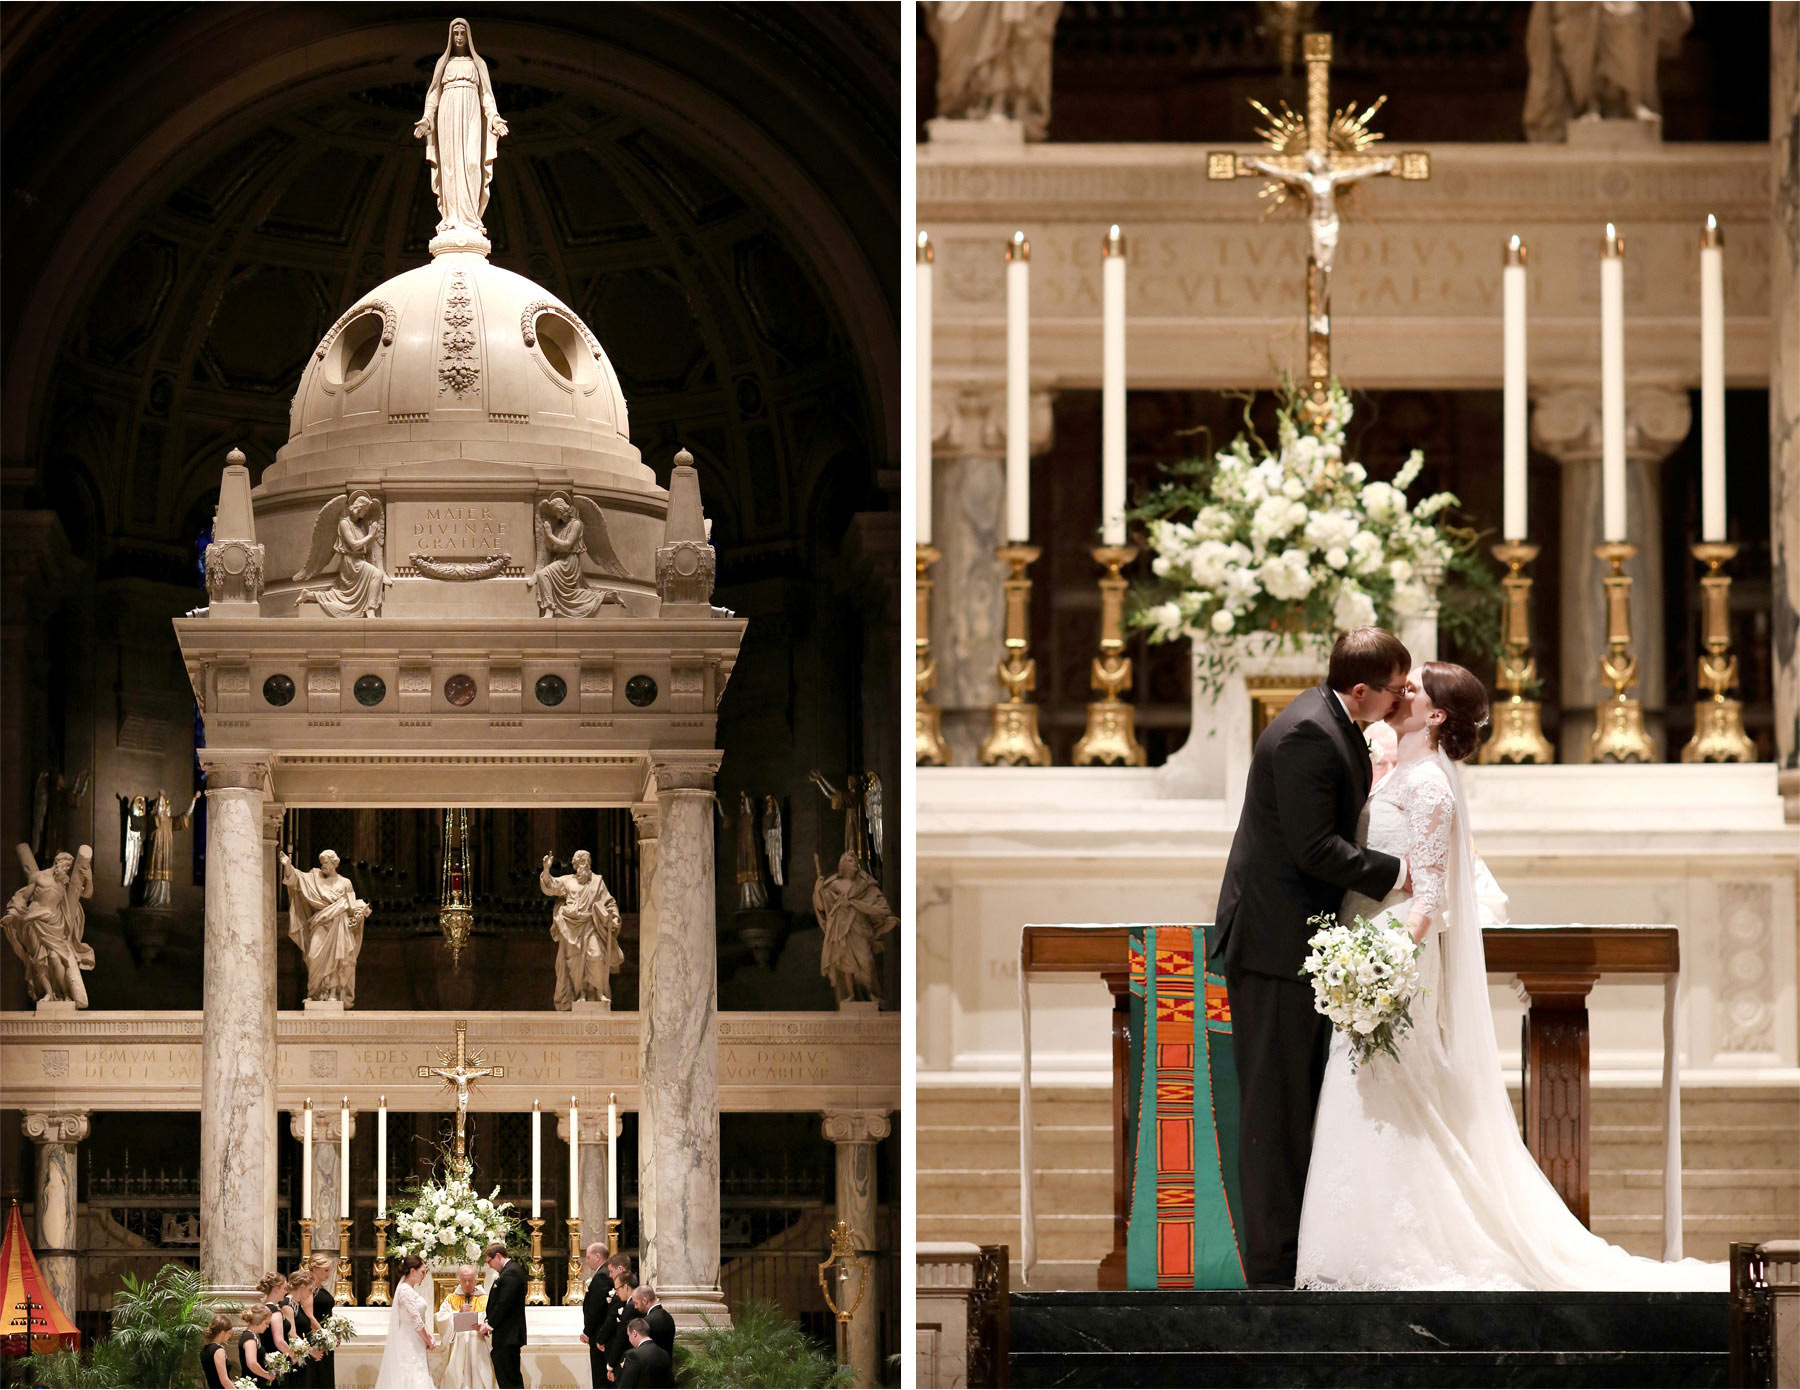 14-Minneapolis-Minnesota-Wedding-Photographer-by-Andrew-Vick-Photography-Winter-Basilica-of-Saint-Mary-Church-Bride-Groom-Prayer-Kiss-Sara-and-Rob.jpg